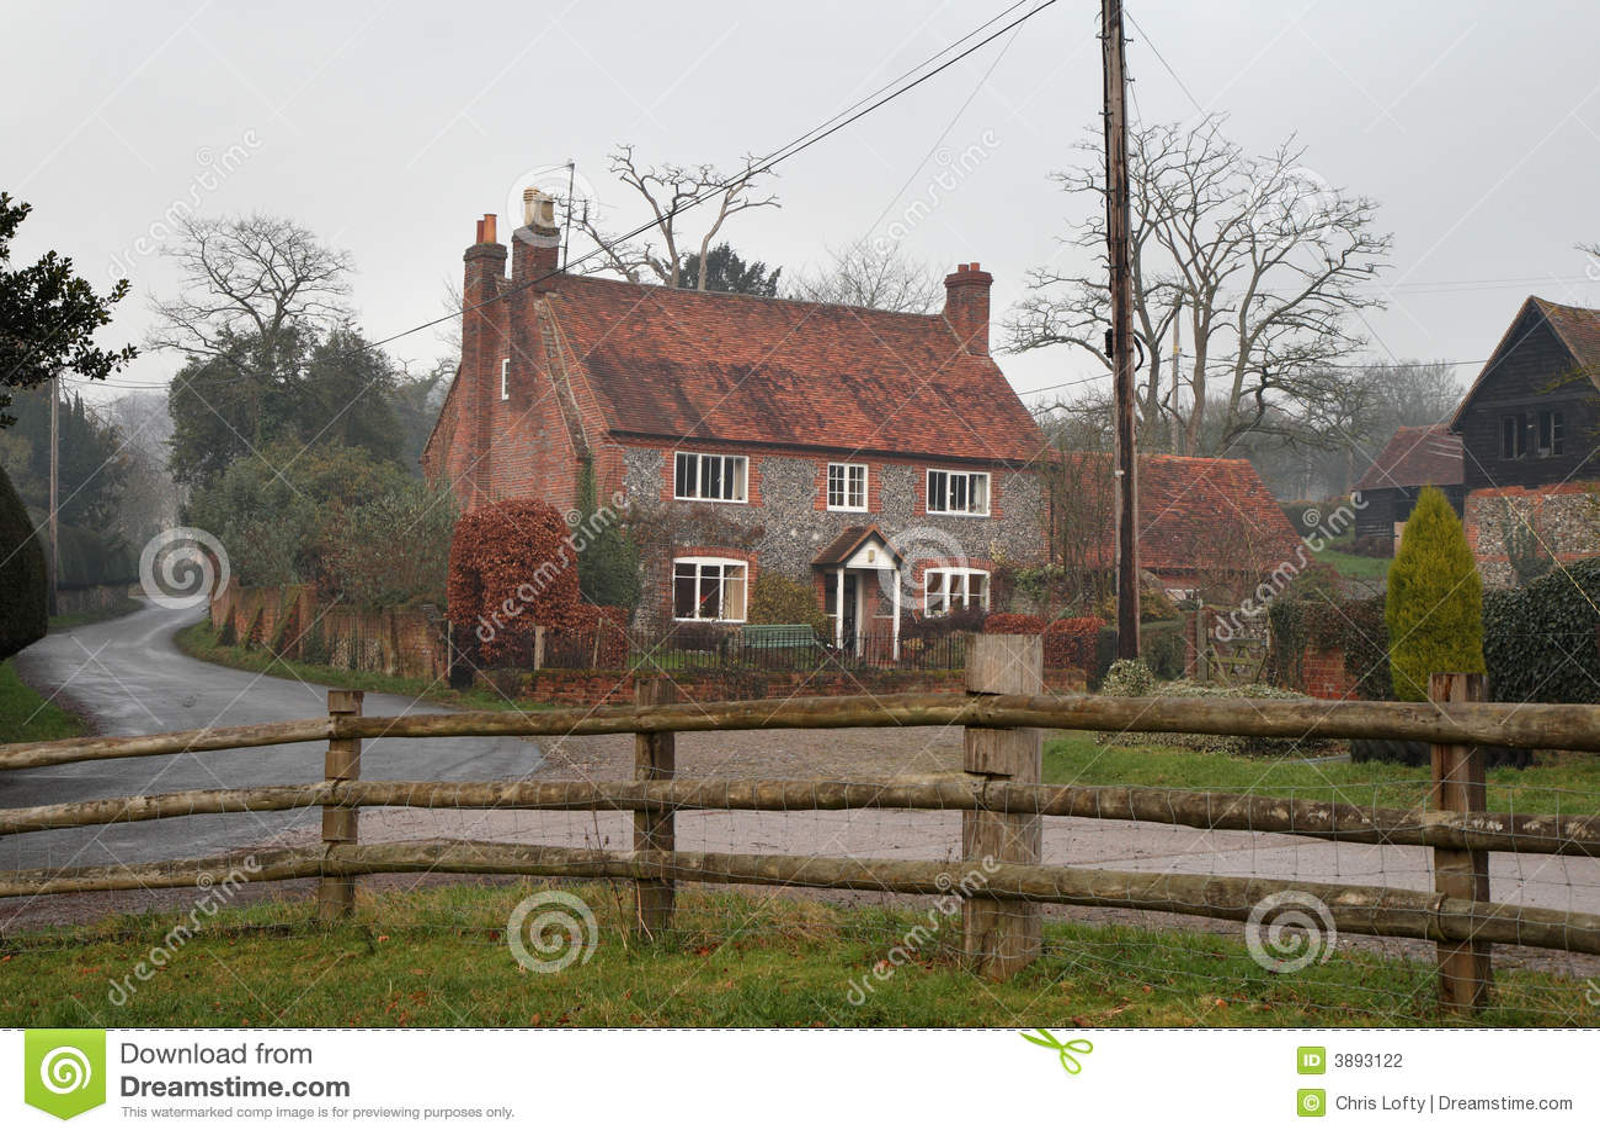 English Rural Farmhouse Stock graphy Image